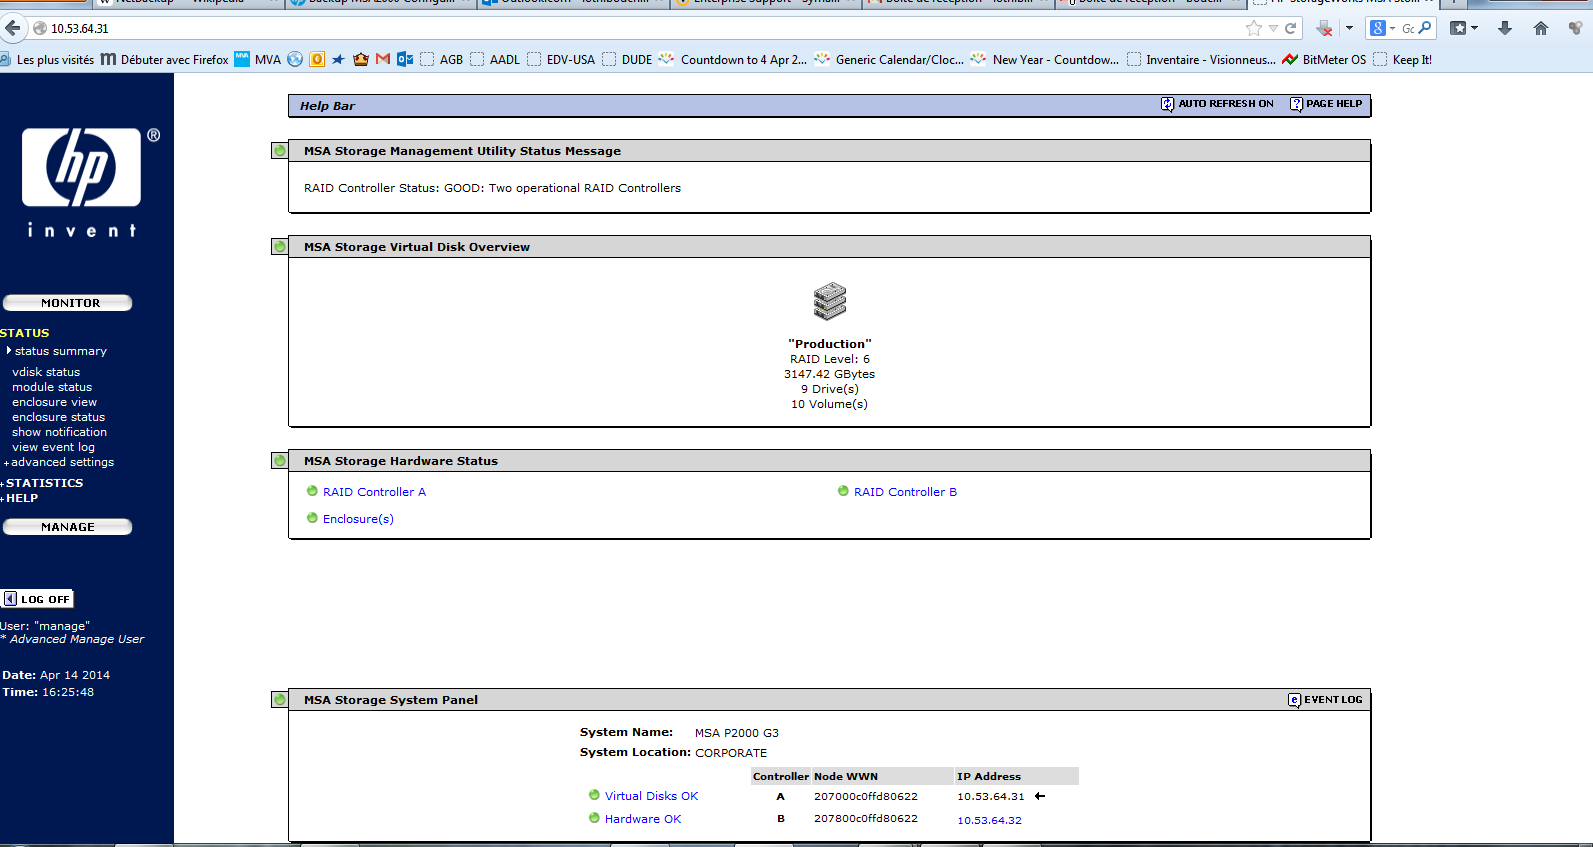 Backup MSA2000 Configuration - Hewlett Packard Enterprise